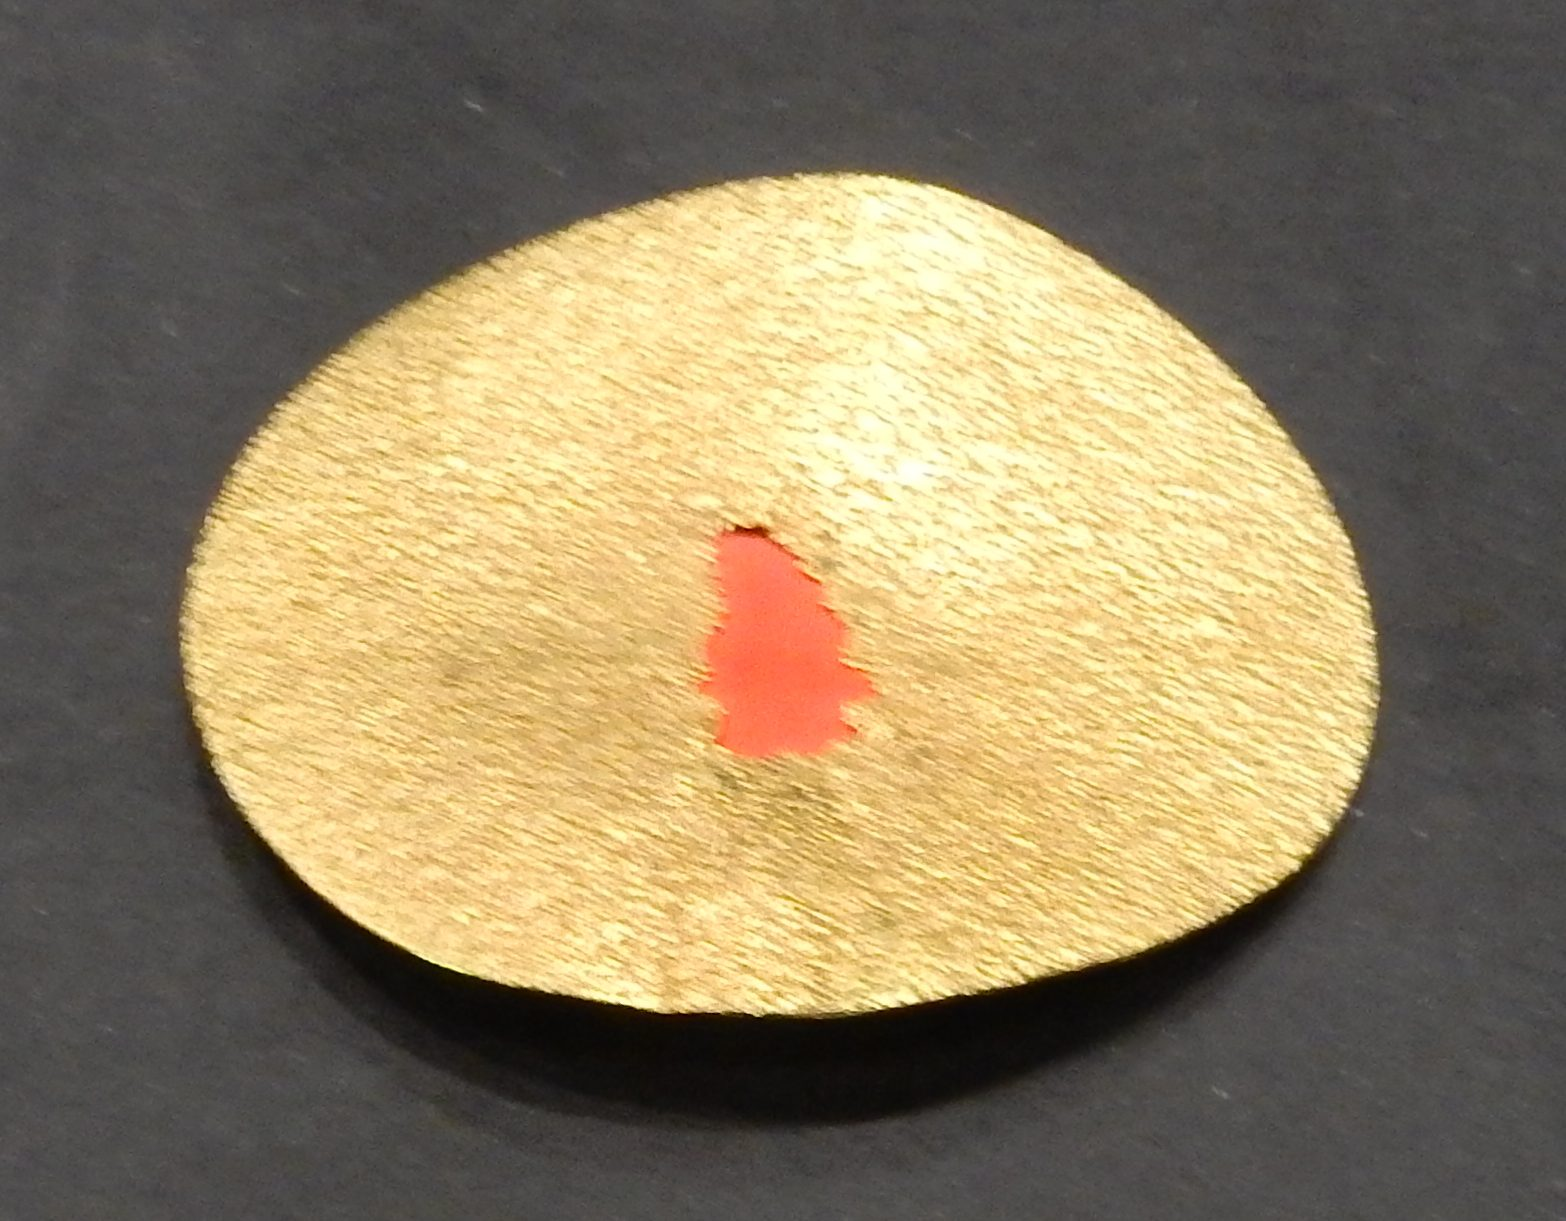 Georg Dobler, The Red Hole, broche, 1992. Show yourself, Design Museum Den Bosch, 2018, Collectie Yvònne Joris (2018 Collectie DMDB, S2018.024), goud